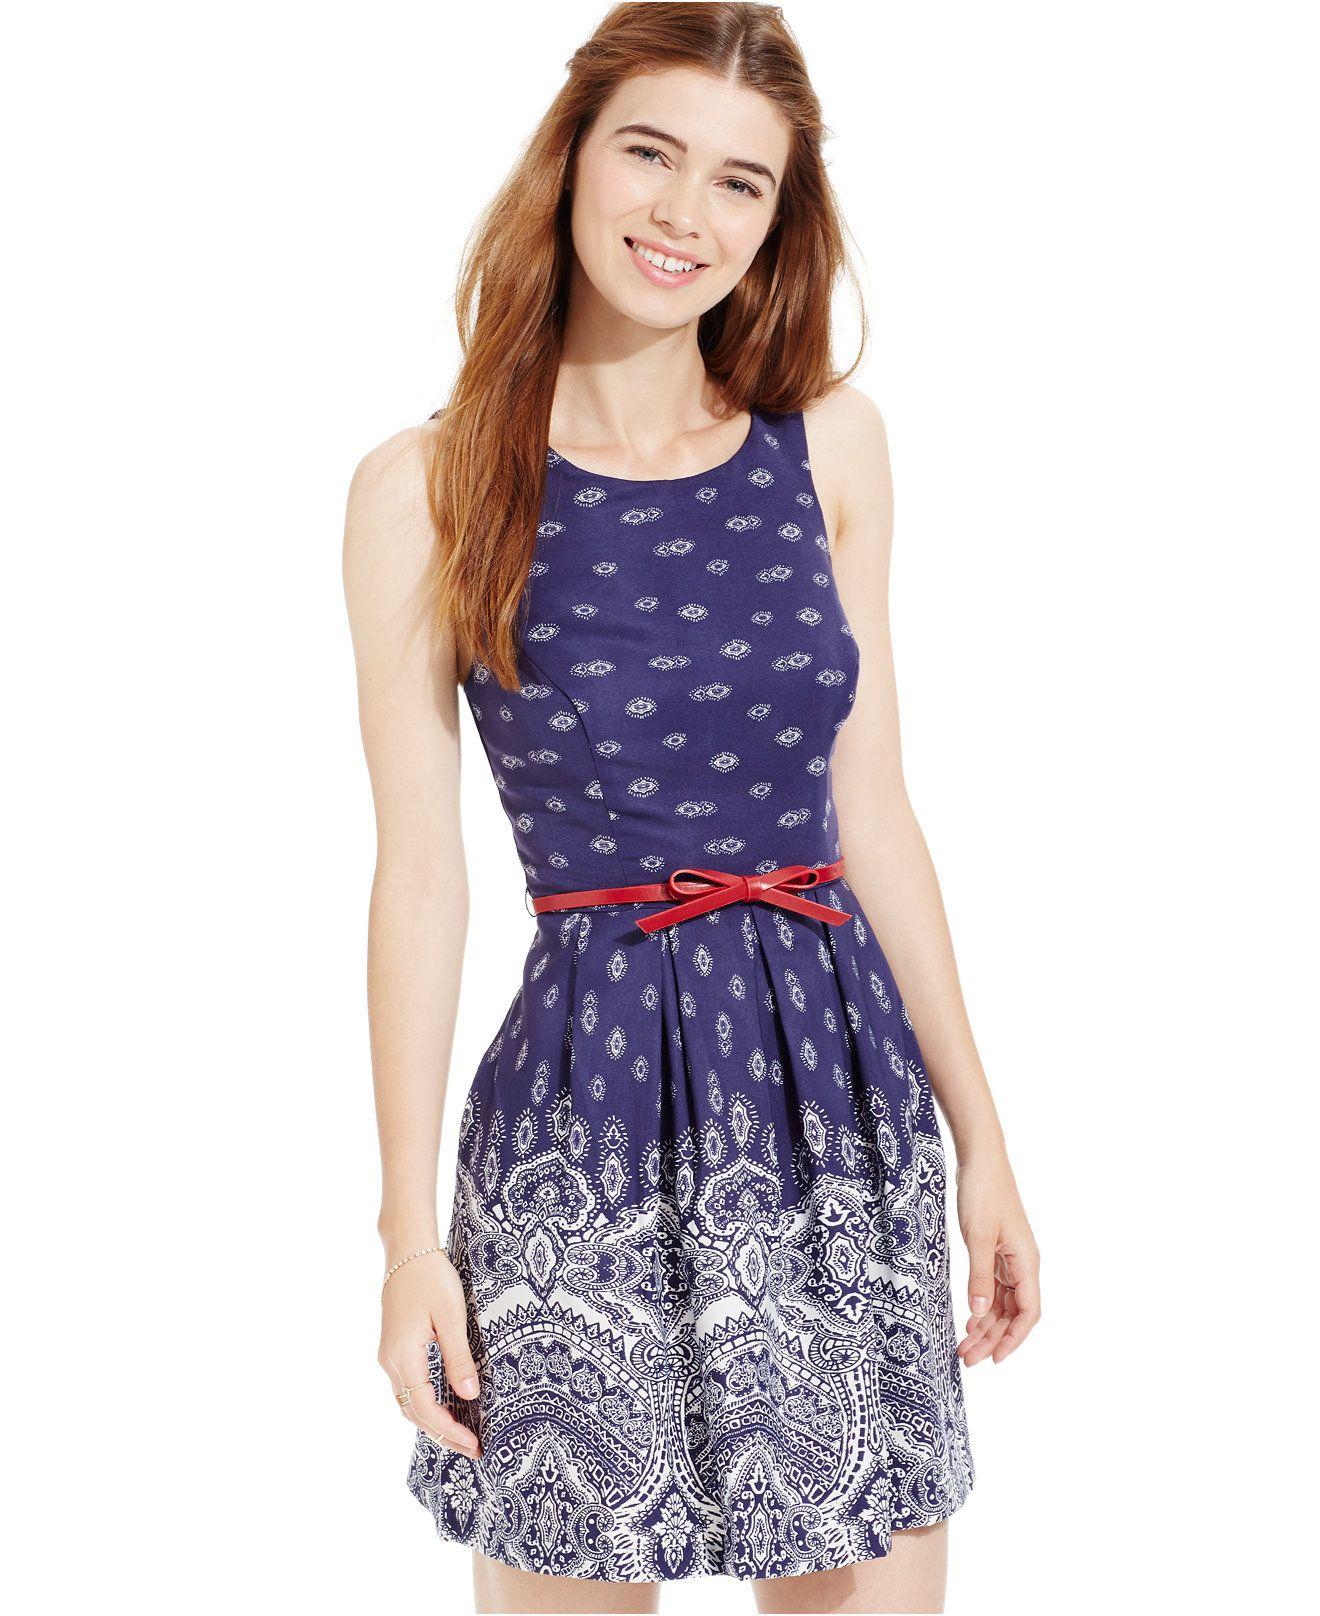 Teeze Me Juniors Printed Belted Dress Juniors Dresses Macy S Junior Dresses Mixed Print Dress Dresses [ 1616 x 1320 Pixel ]